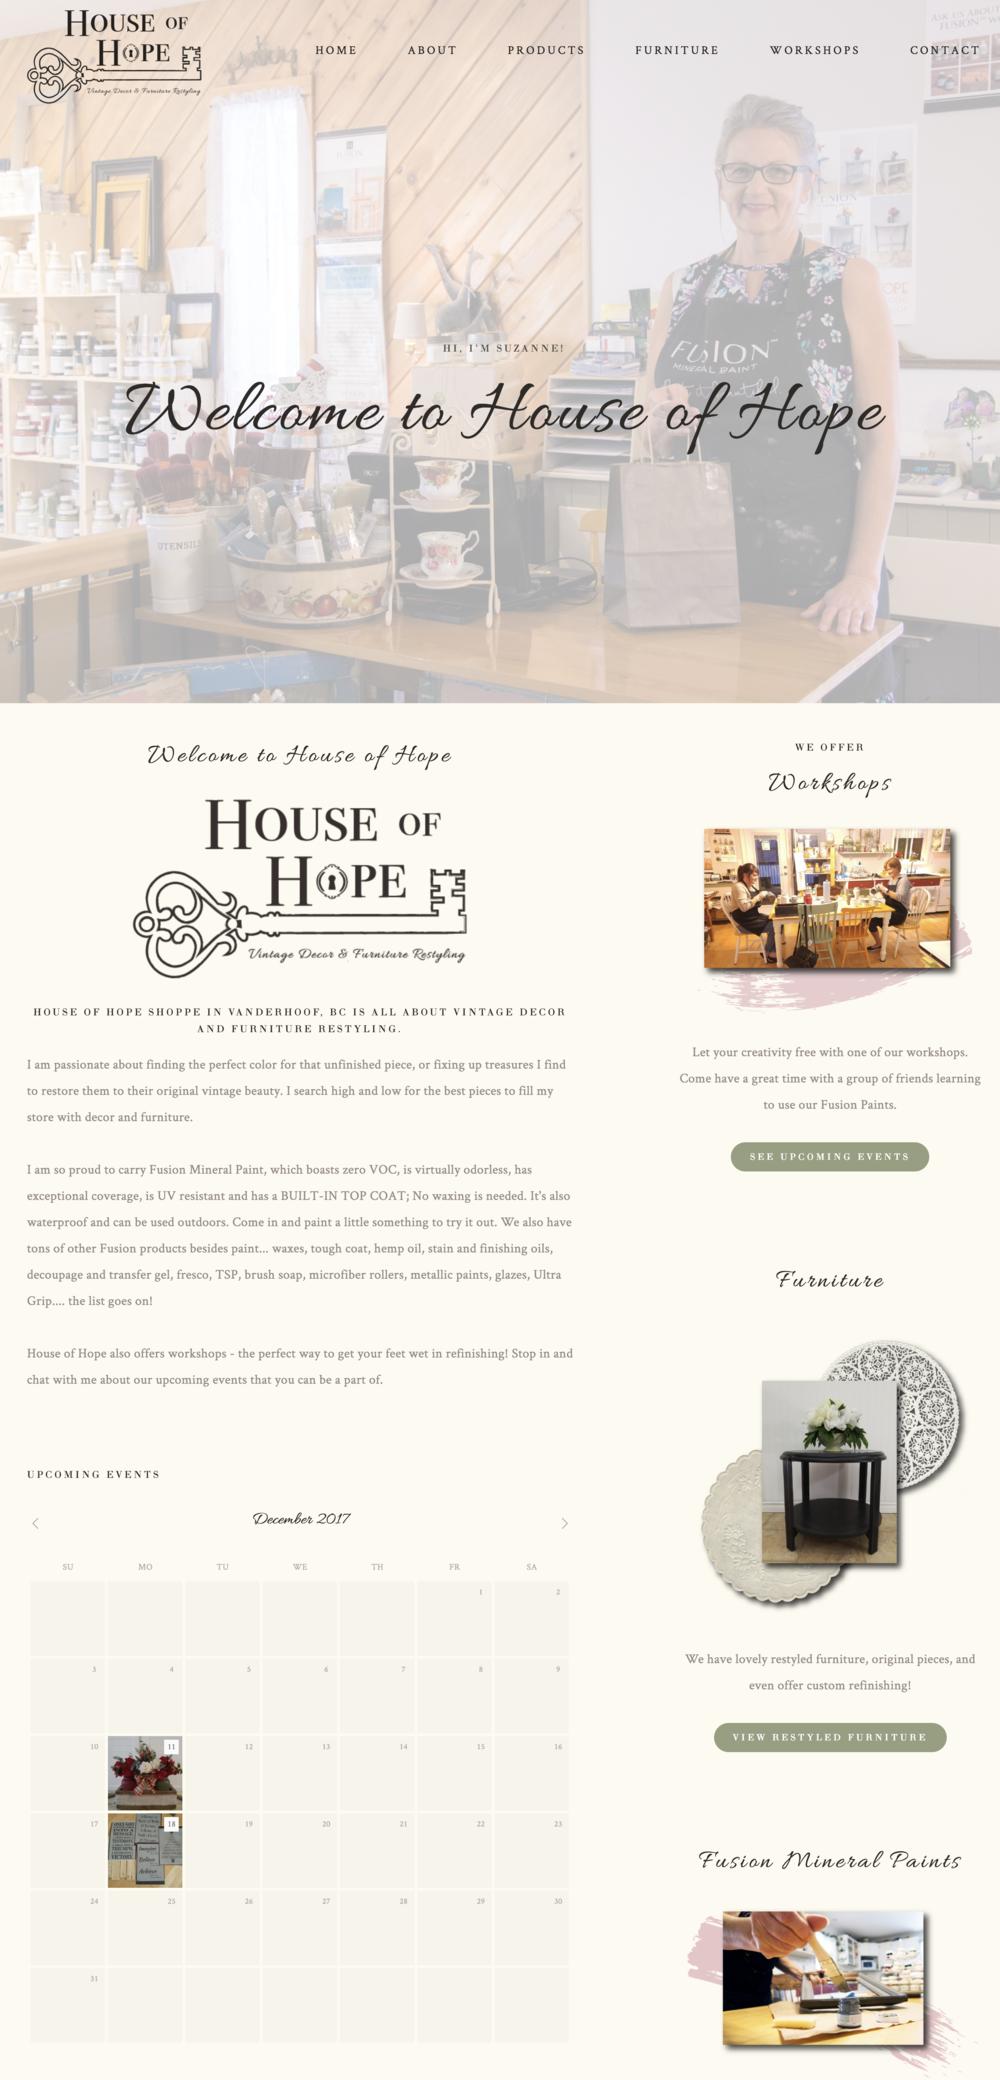 House of Hope blog screenshot.png